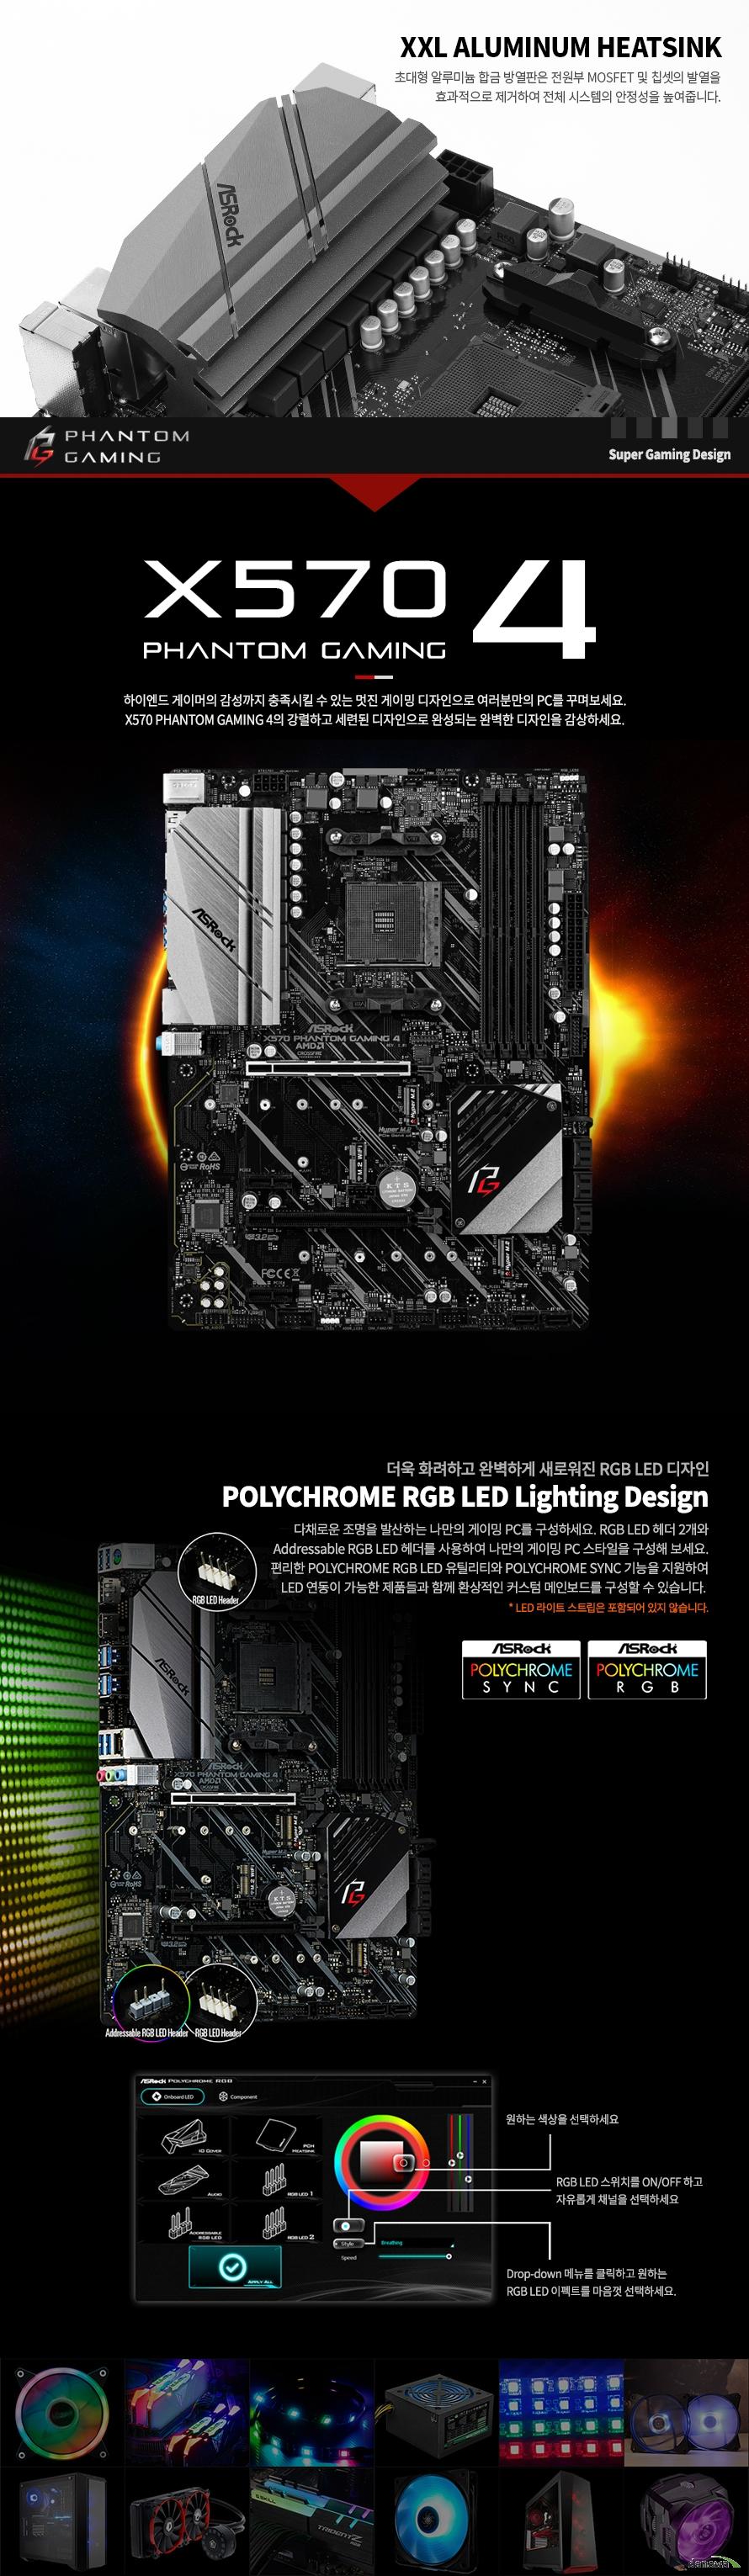 ASRock  X570 Phantom Gaming 4 에즈윈